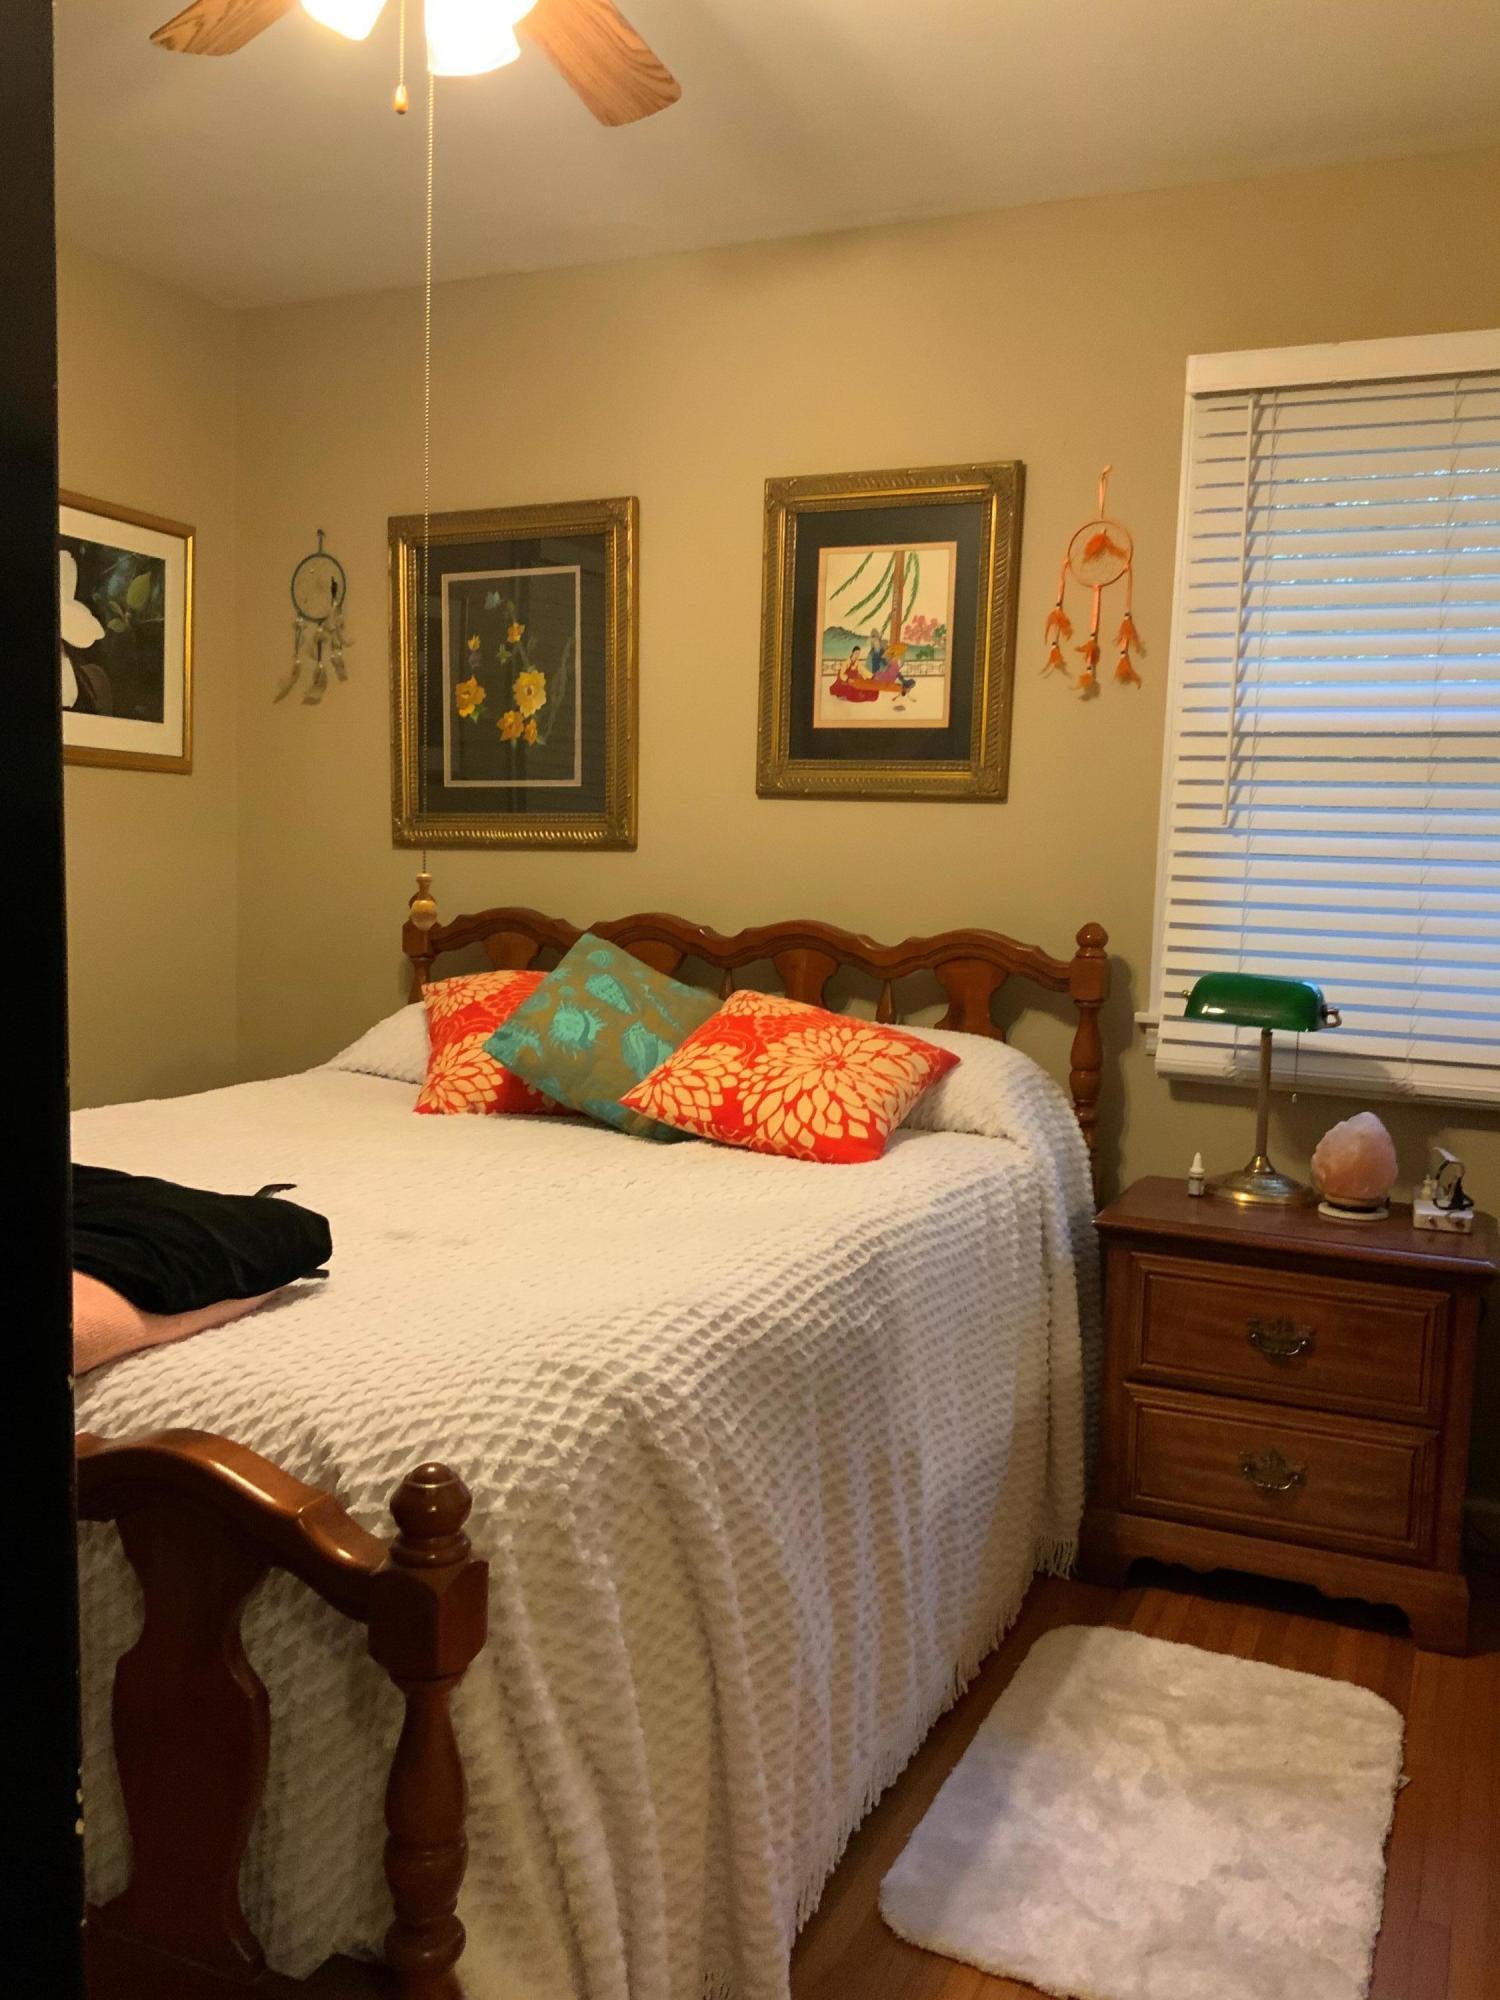 Northbridge Terrace Homes For Sale - 1156 Northbridge, Charleston, SC - 15